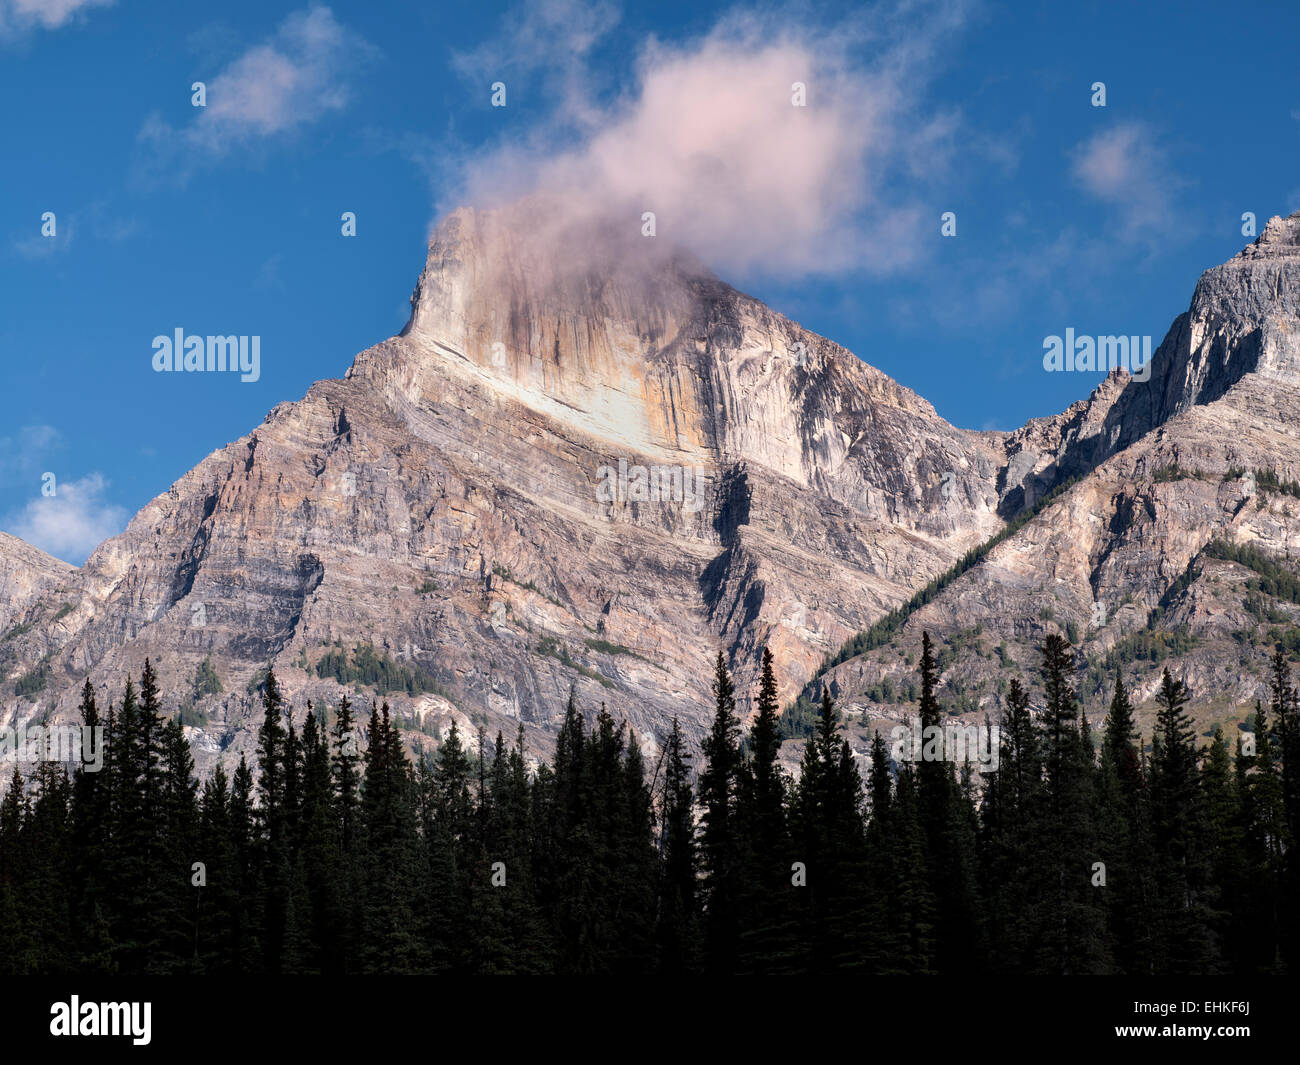 Silhouette Bäume, Berge und Wolken. Banff Nationalpark. Alberta, Kanada Stockbild